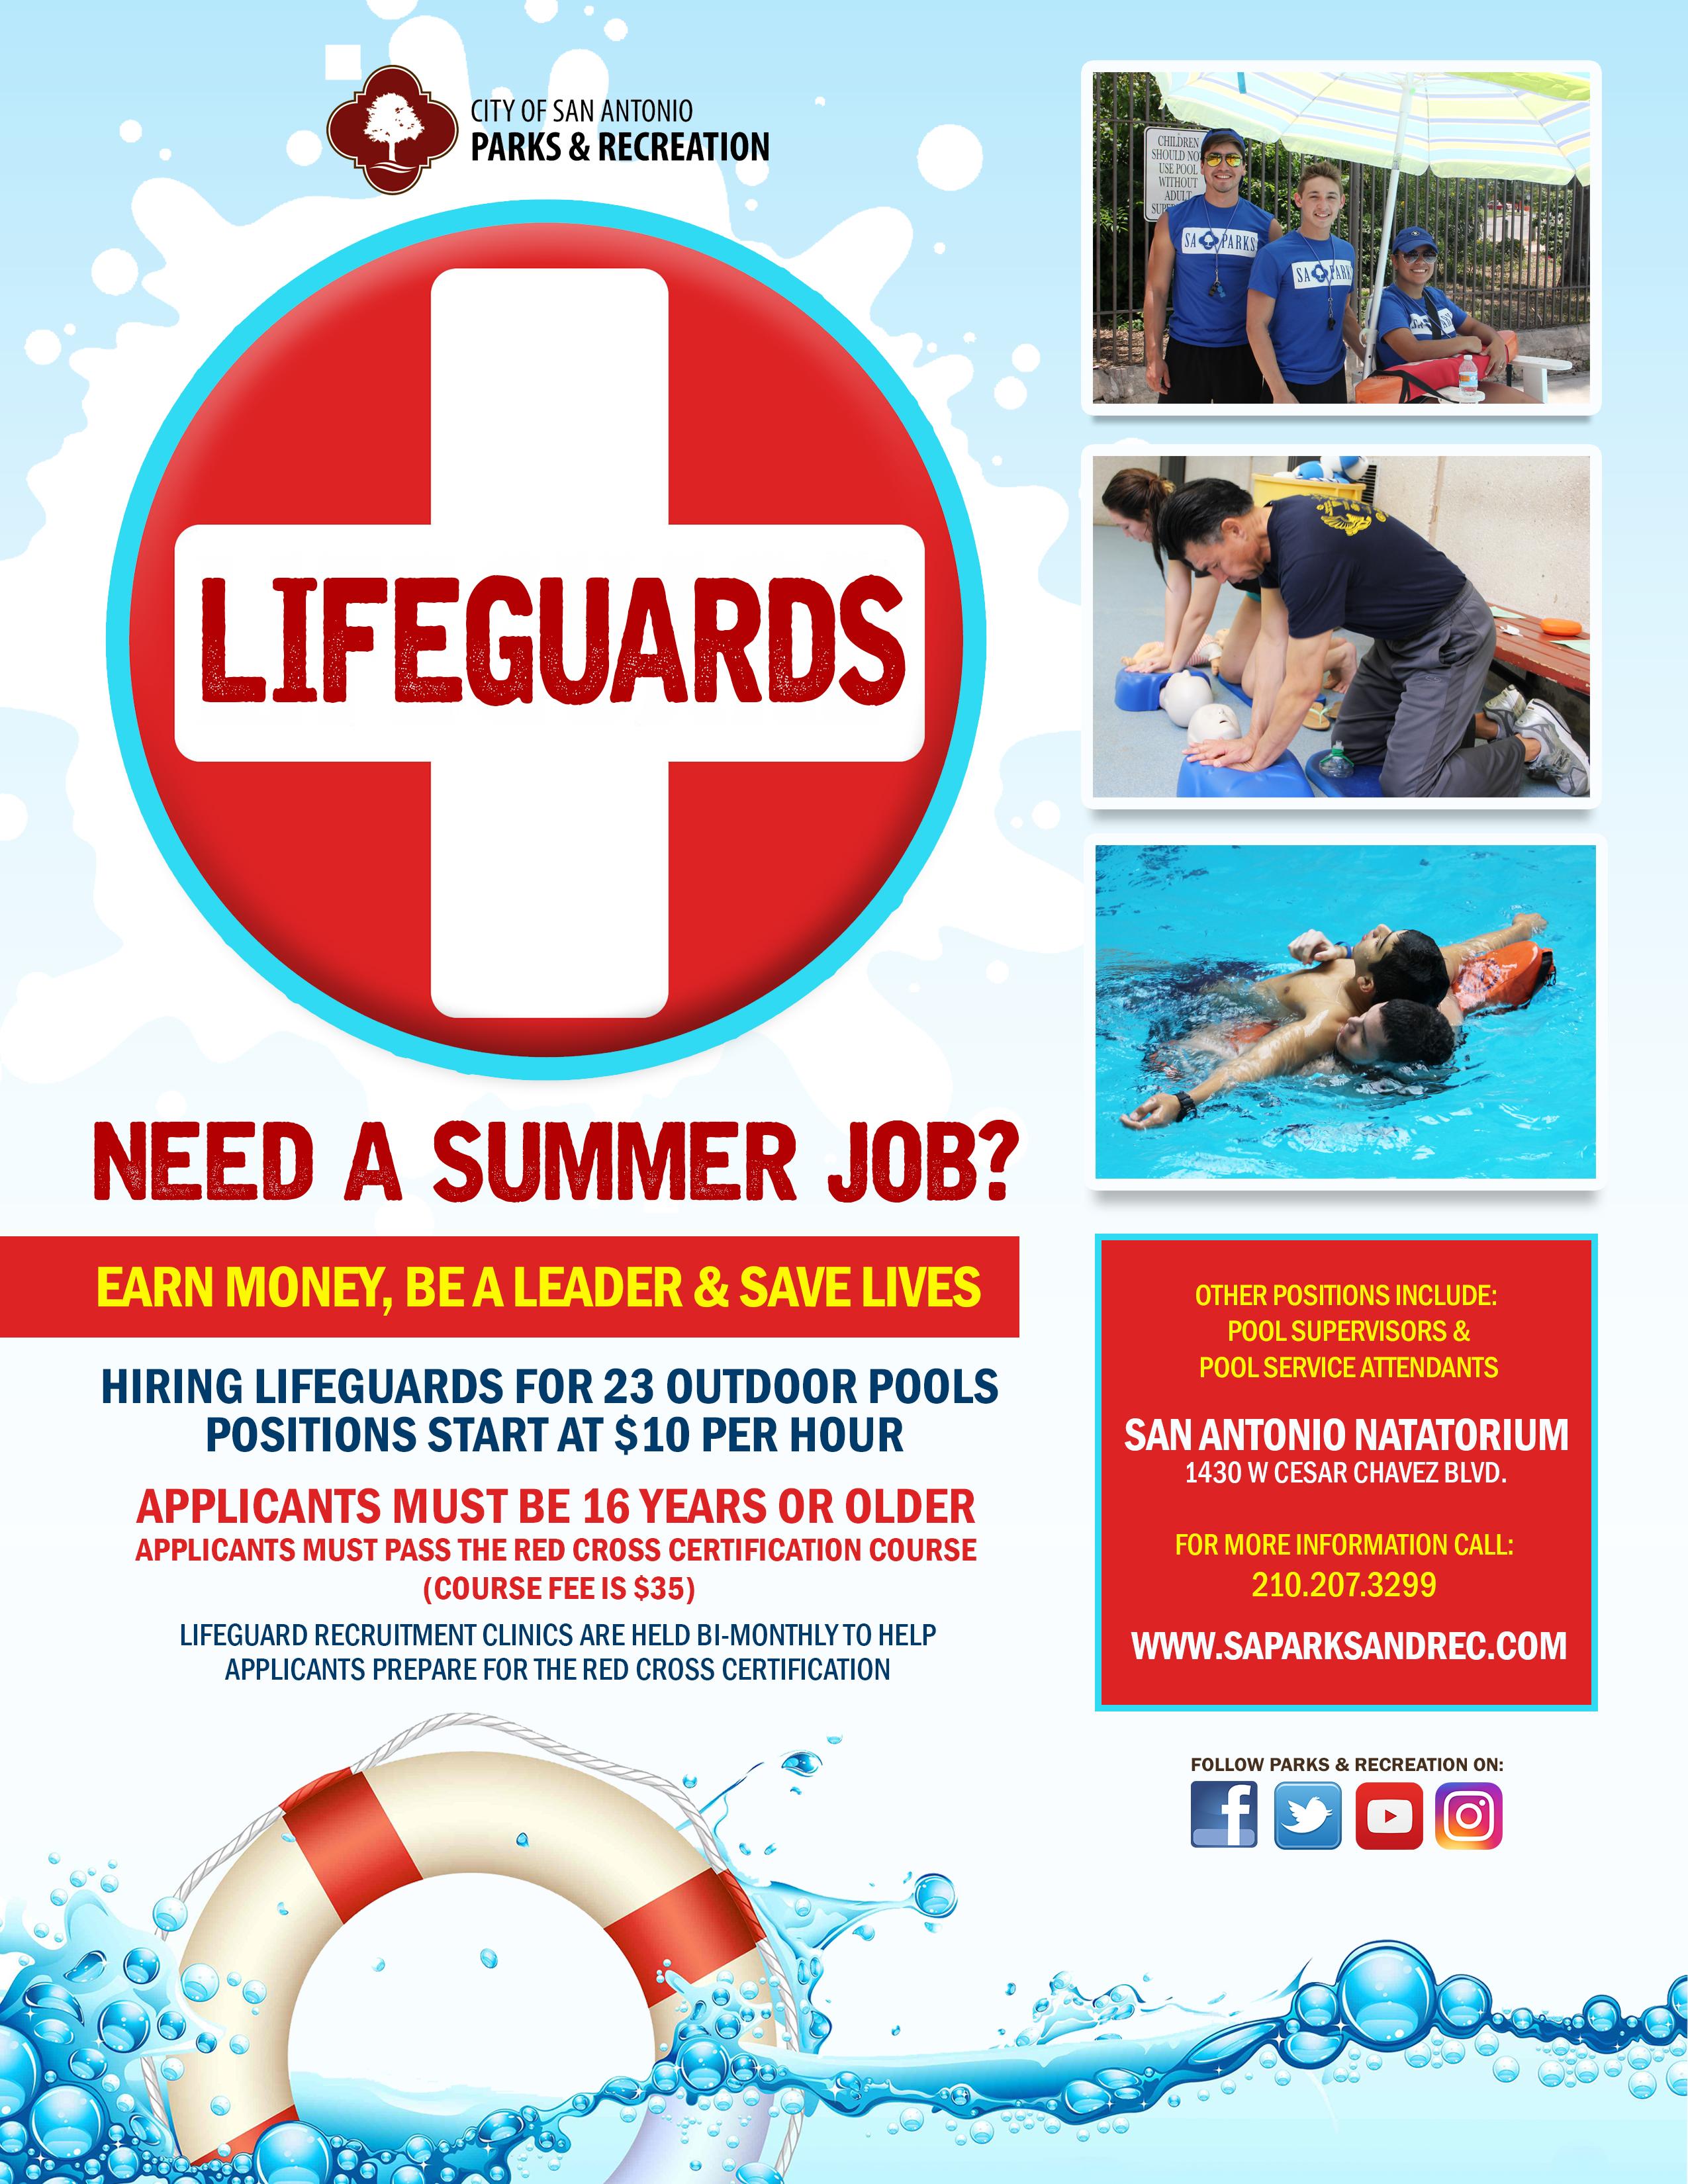 Lifeguard Recruitment Events The City Of San Antonio